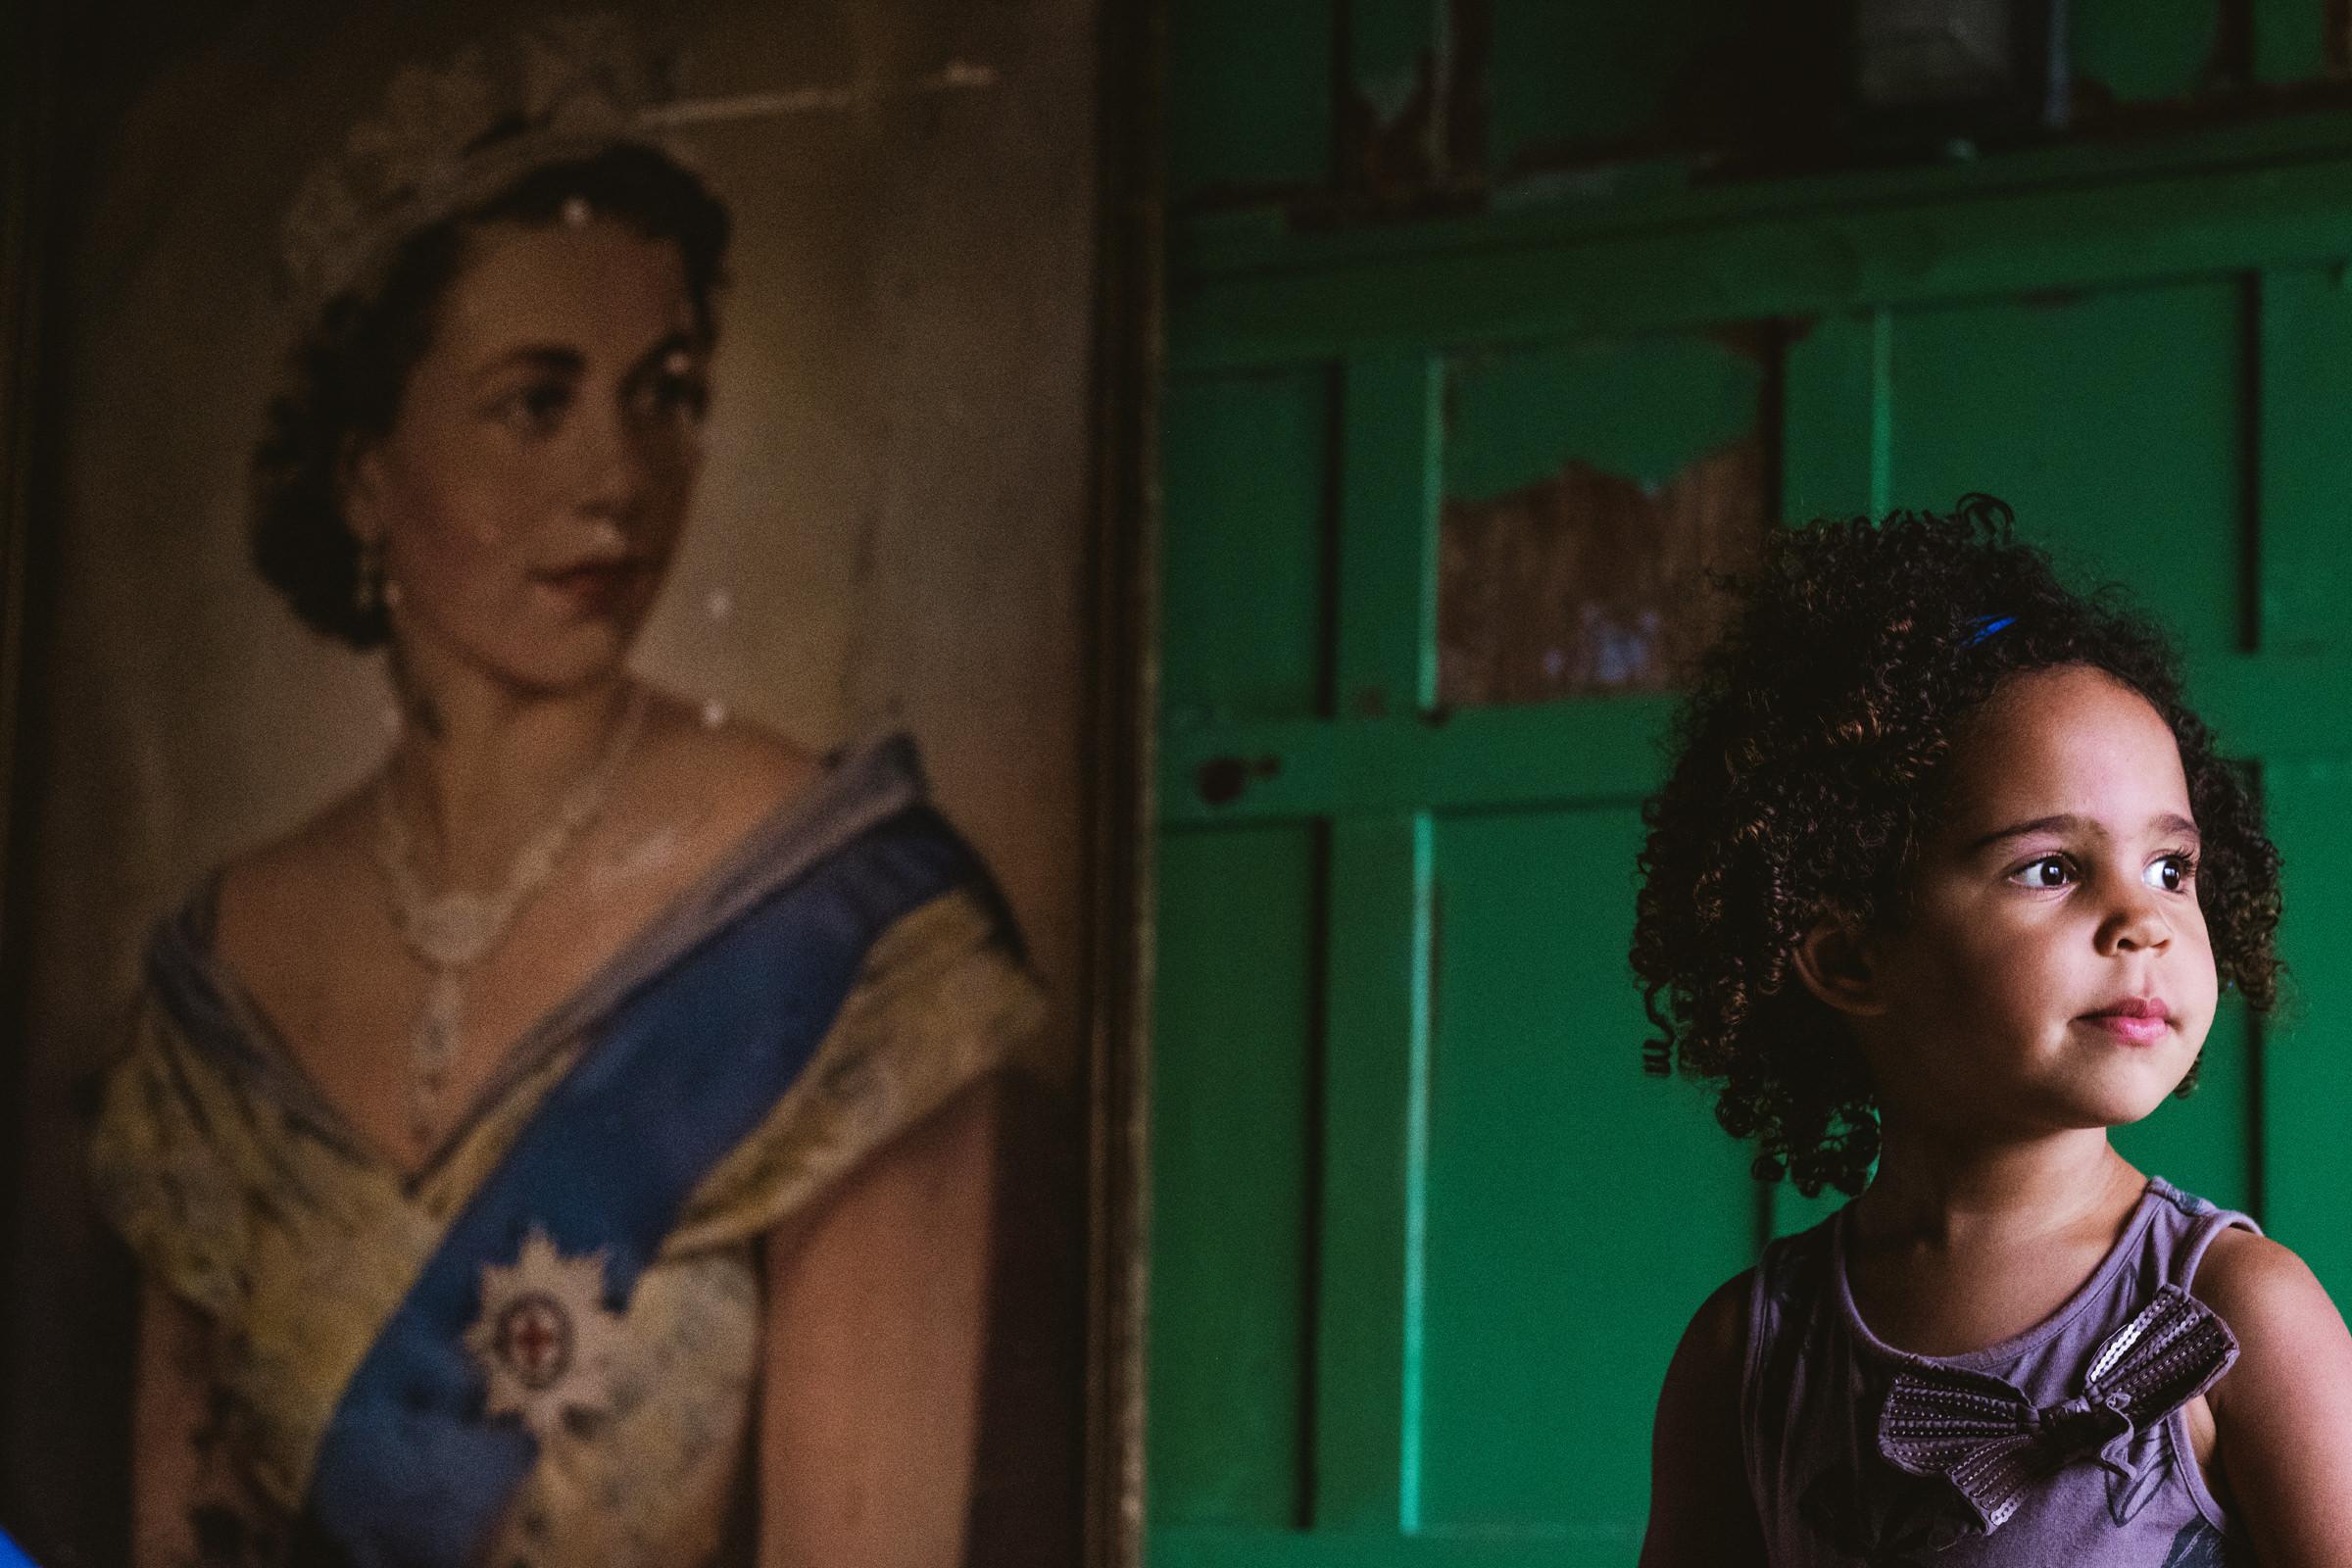 Little girl mimics portrait of a queen - photo by York Place Studios